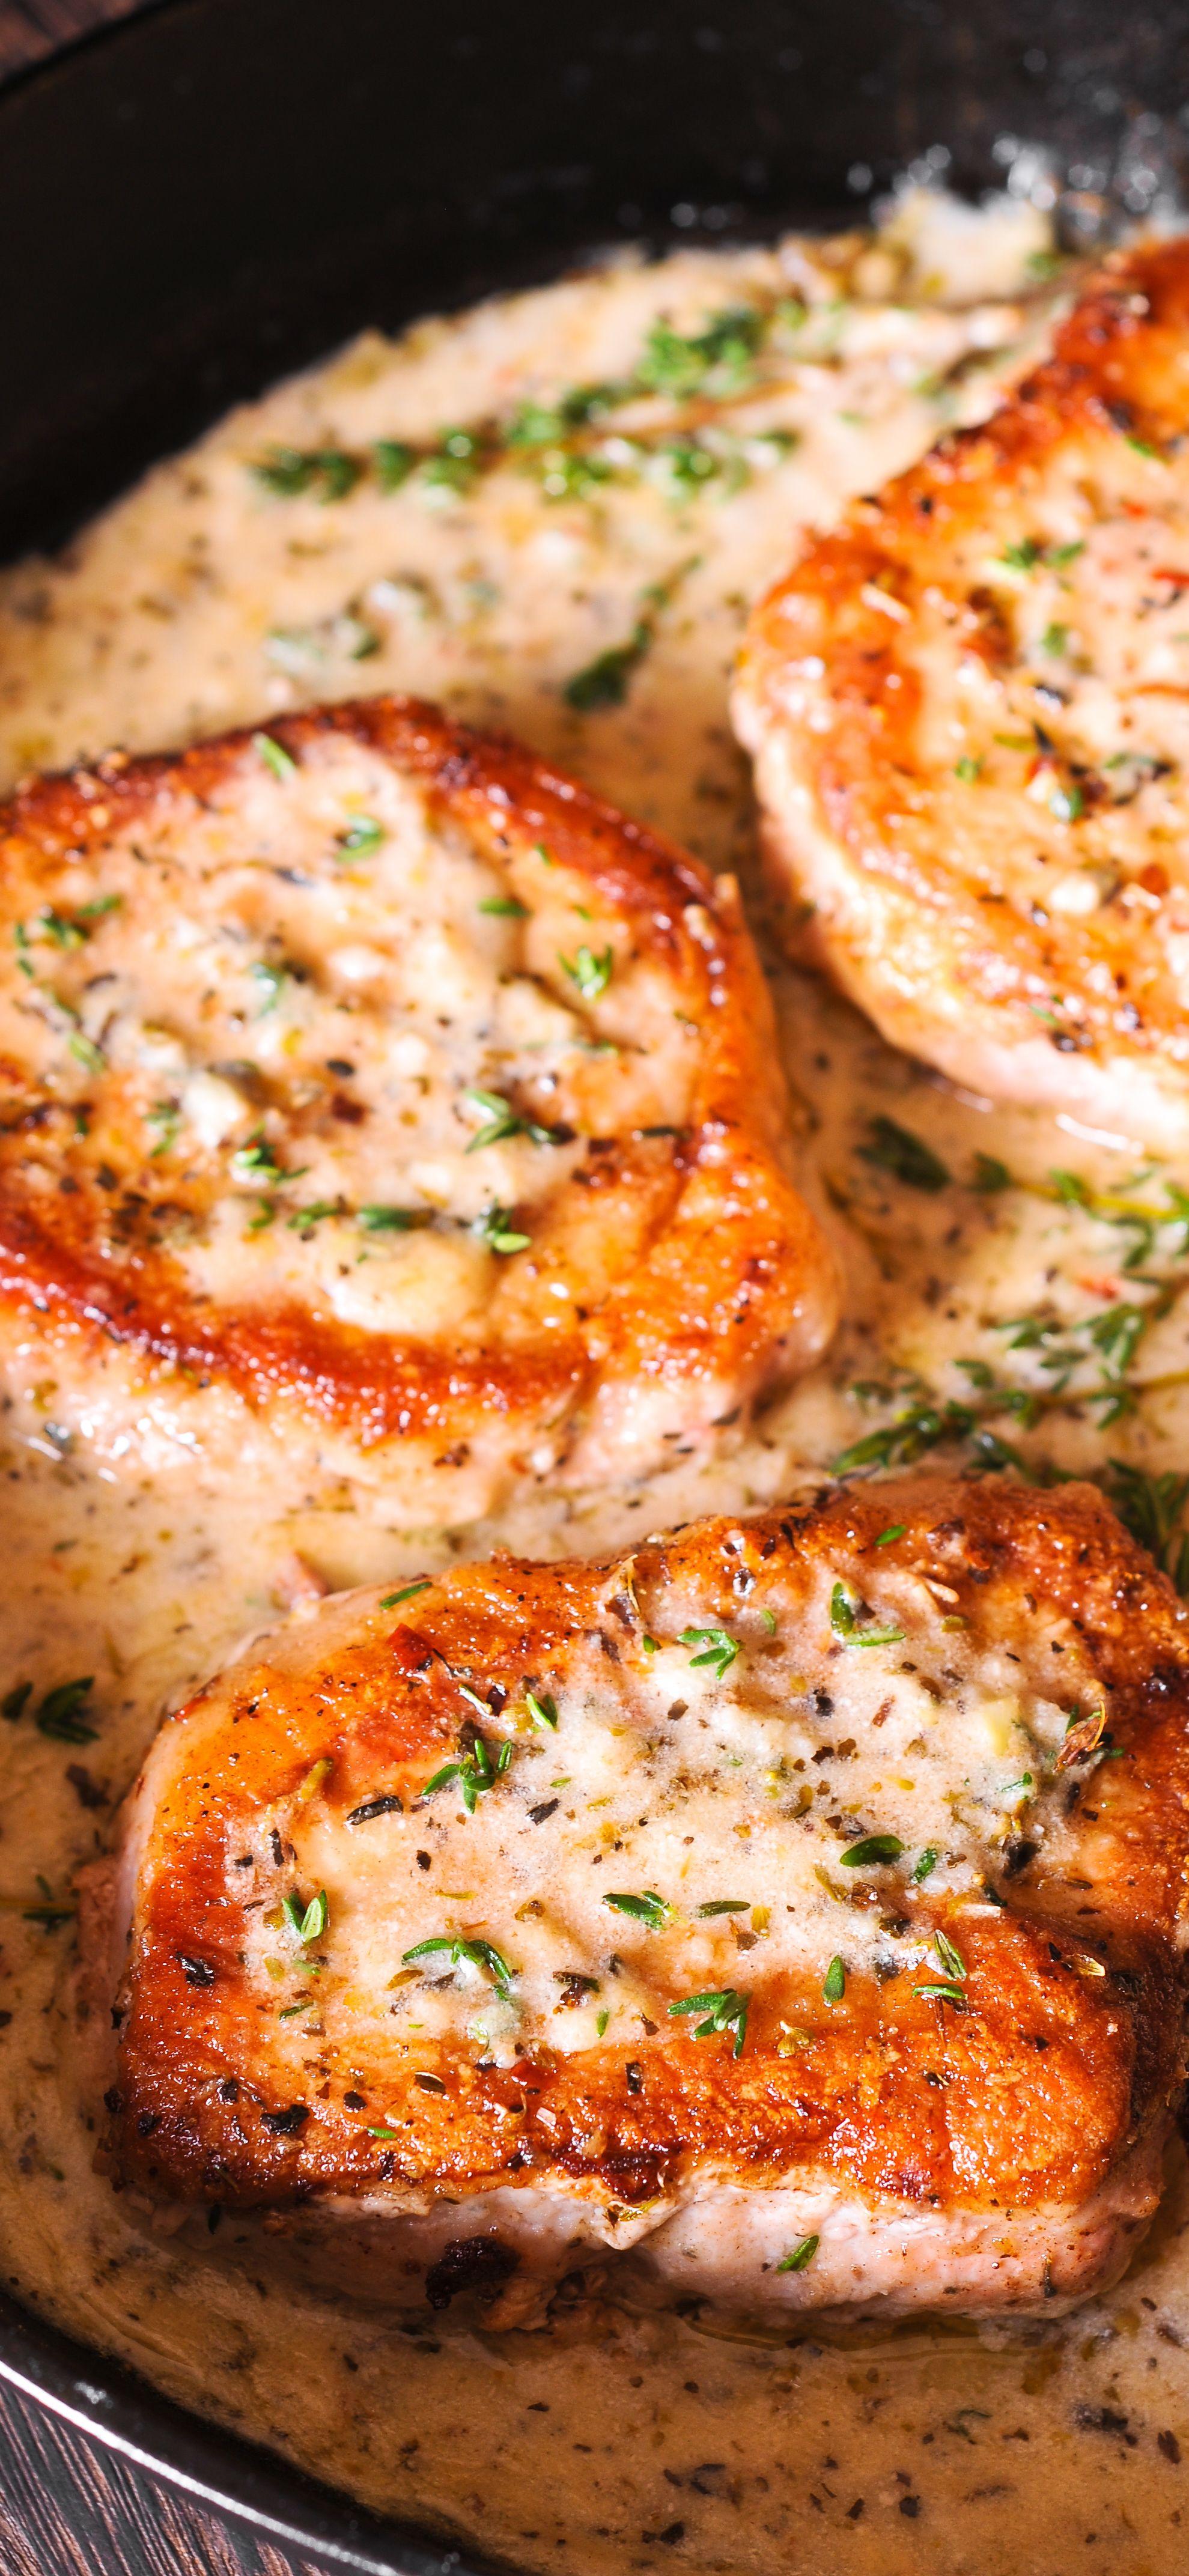 pork chops in creamy garlic and wine sauce #pork #dinner. try ff